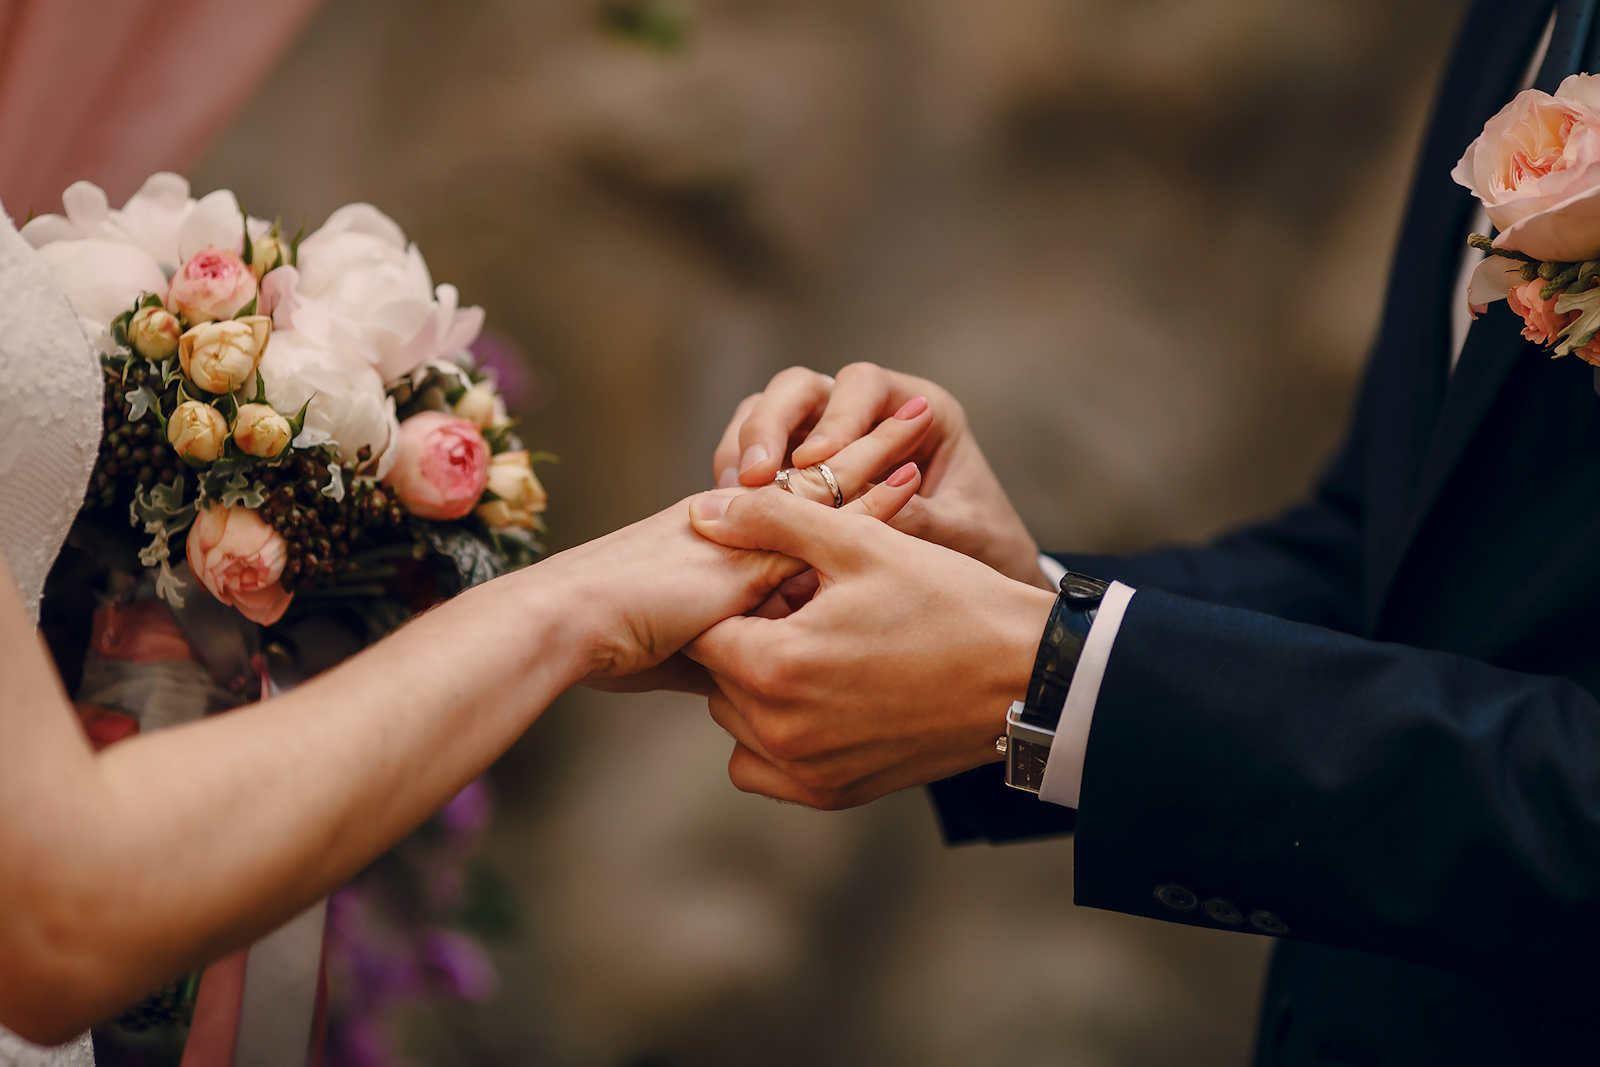 Weddings & Events Unlimited of Bibra Lake